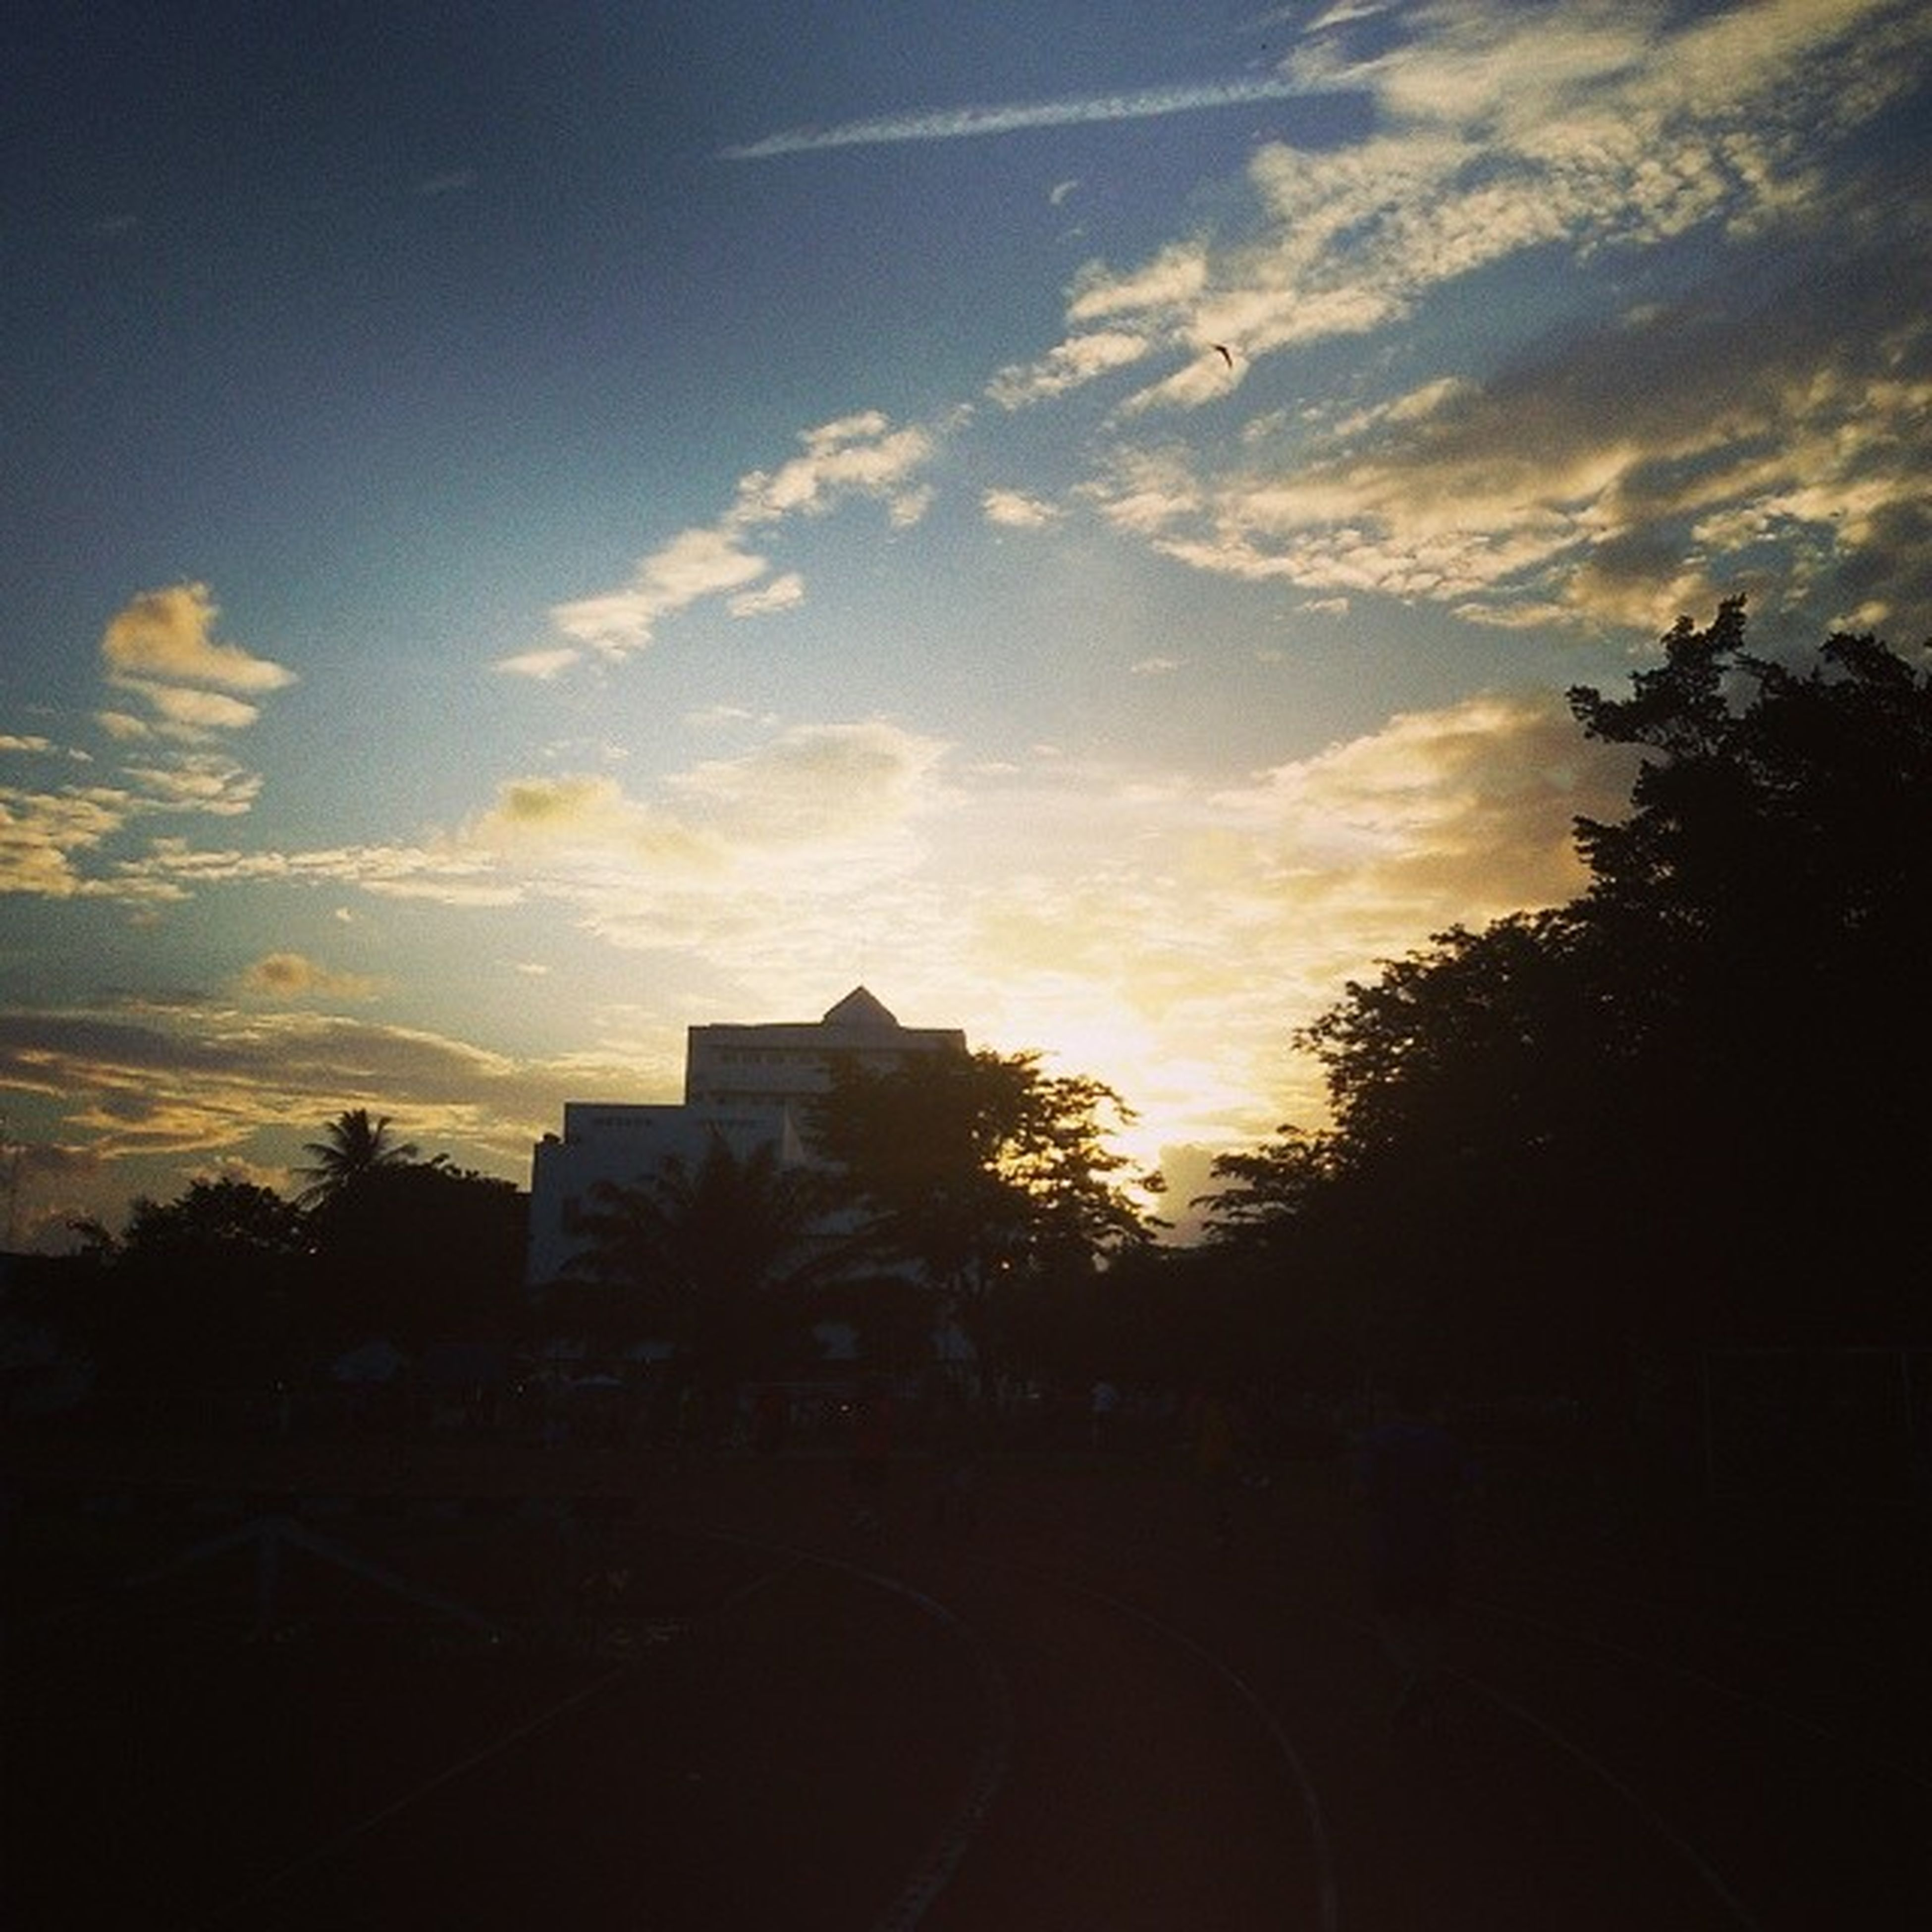 architecture, silhouette, building exterior, built structure, sunset, sky, tree, cloud - sky, road, city, cloud, dusk, outdoors, no people, house, building, dark, transportation, street, nature